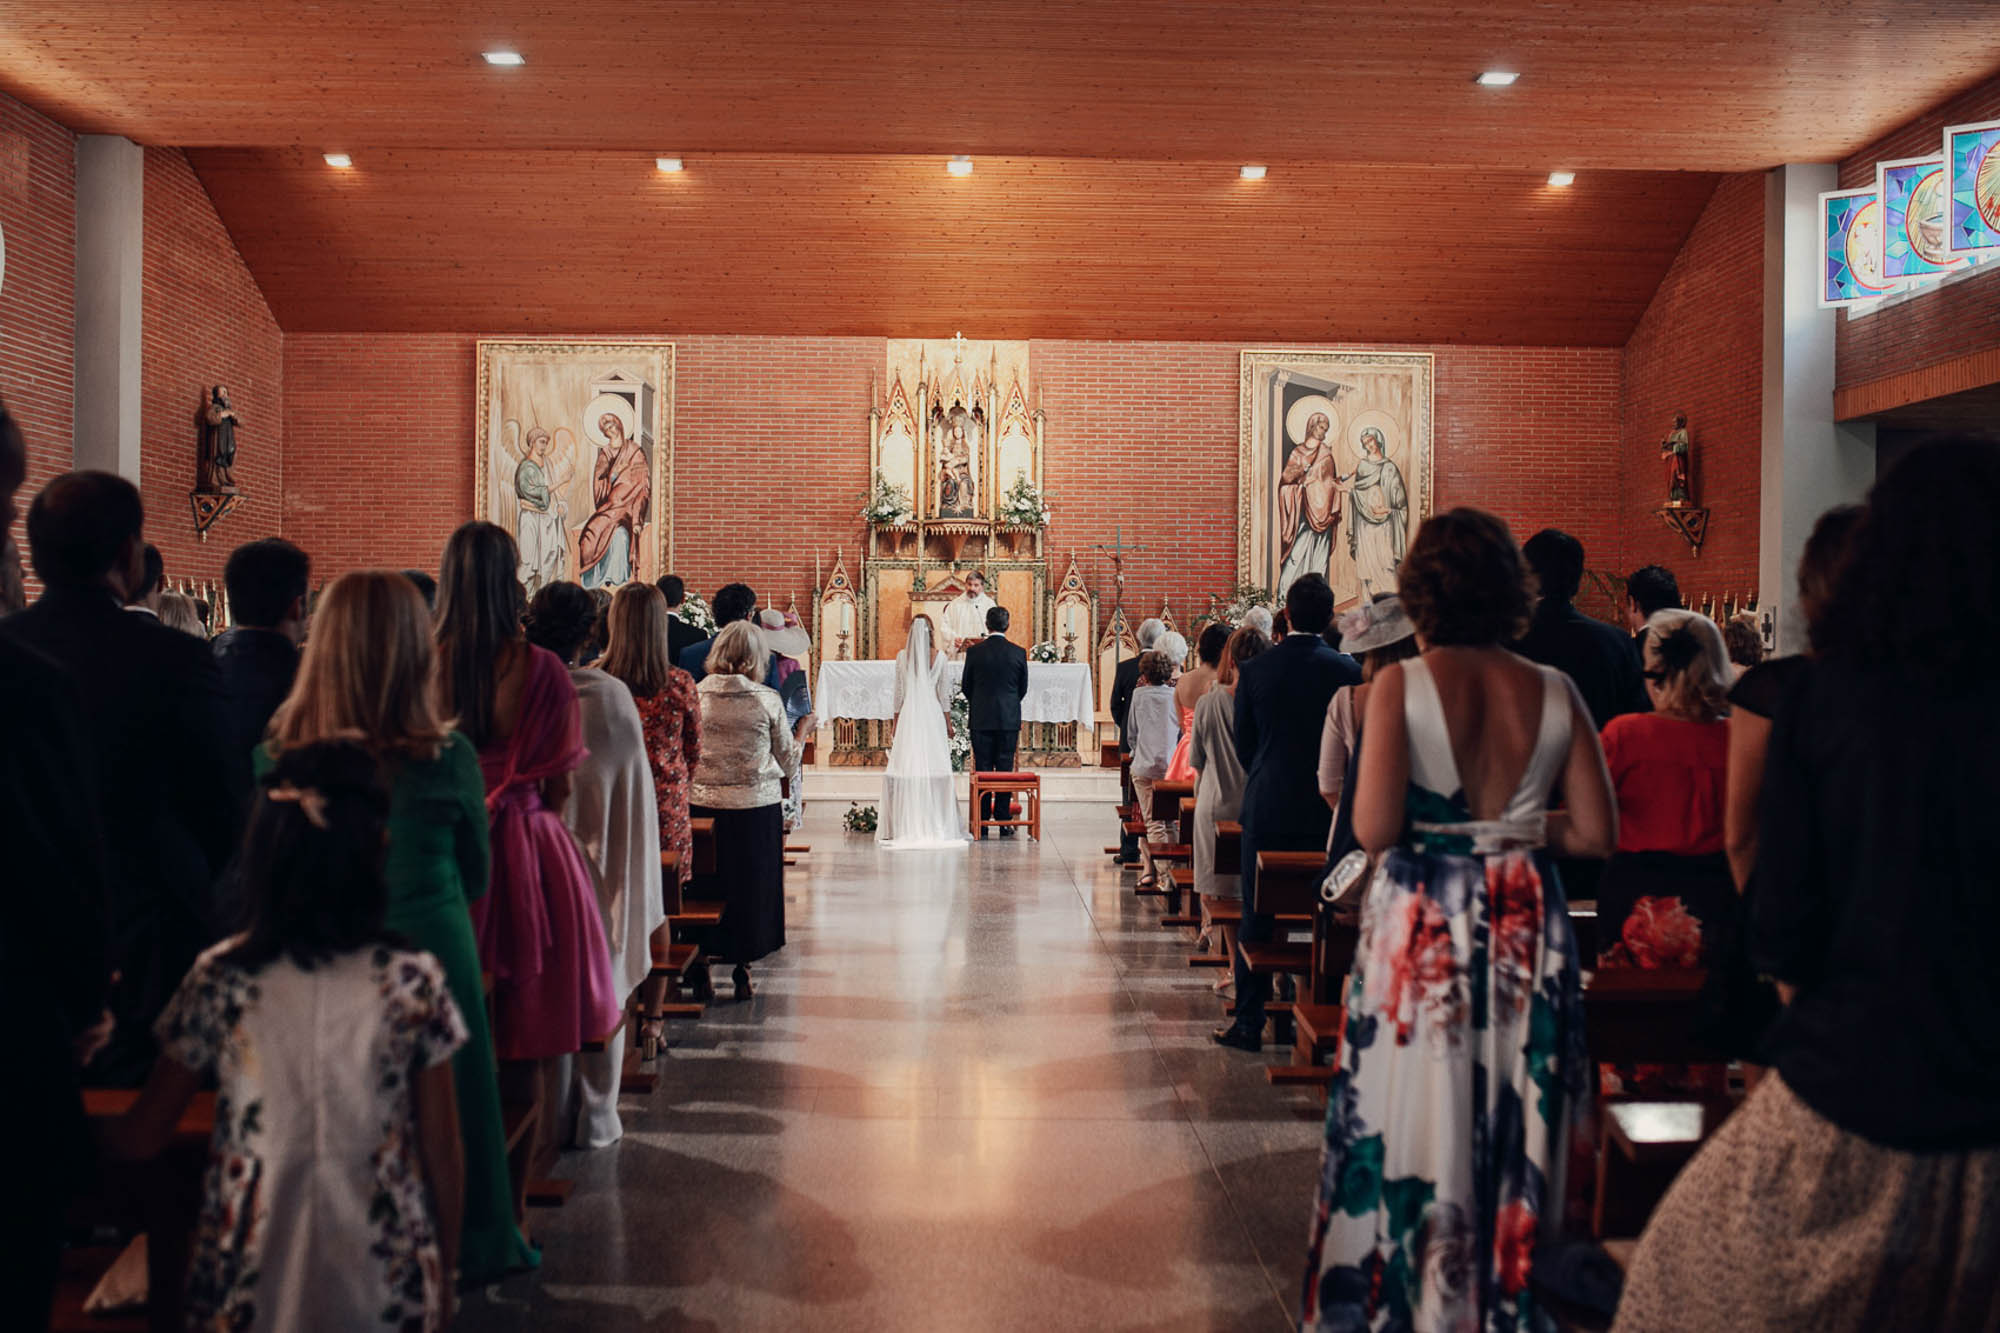 iglesia invitados novios altar misa fotografia boda